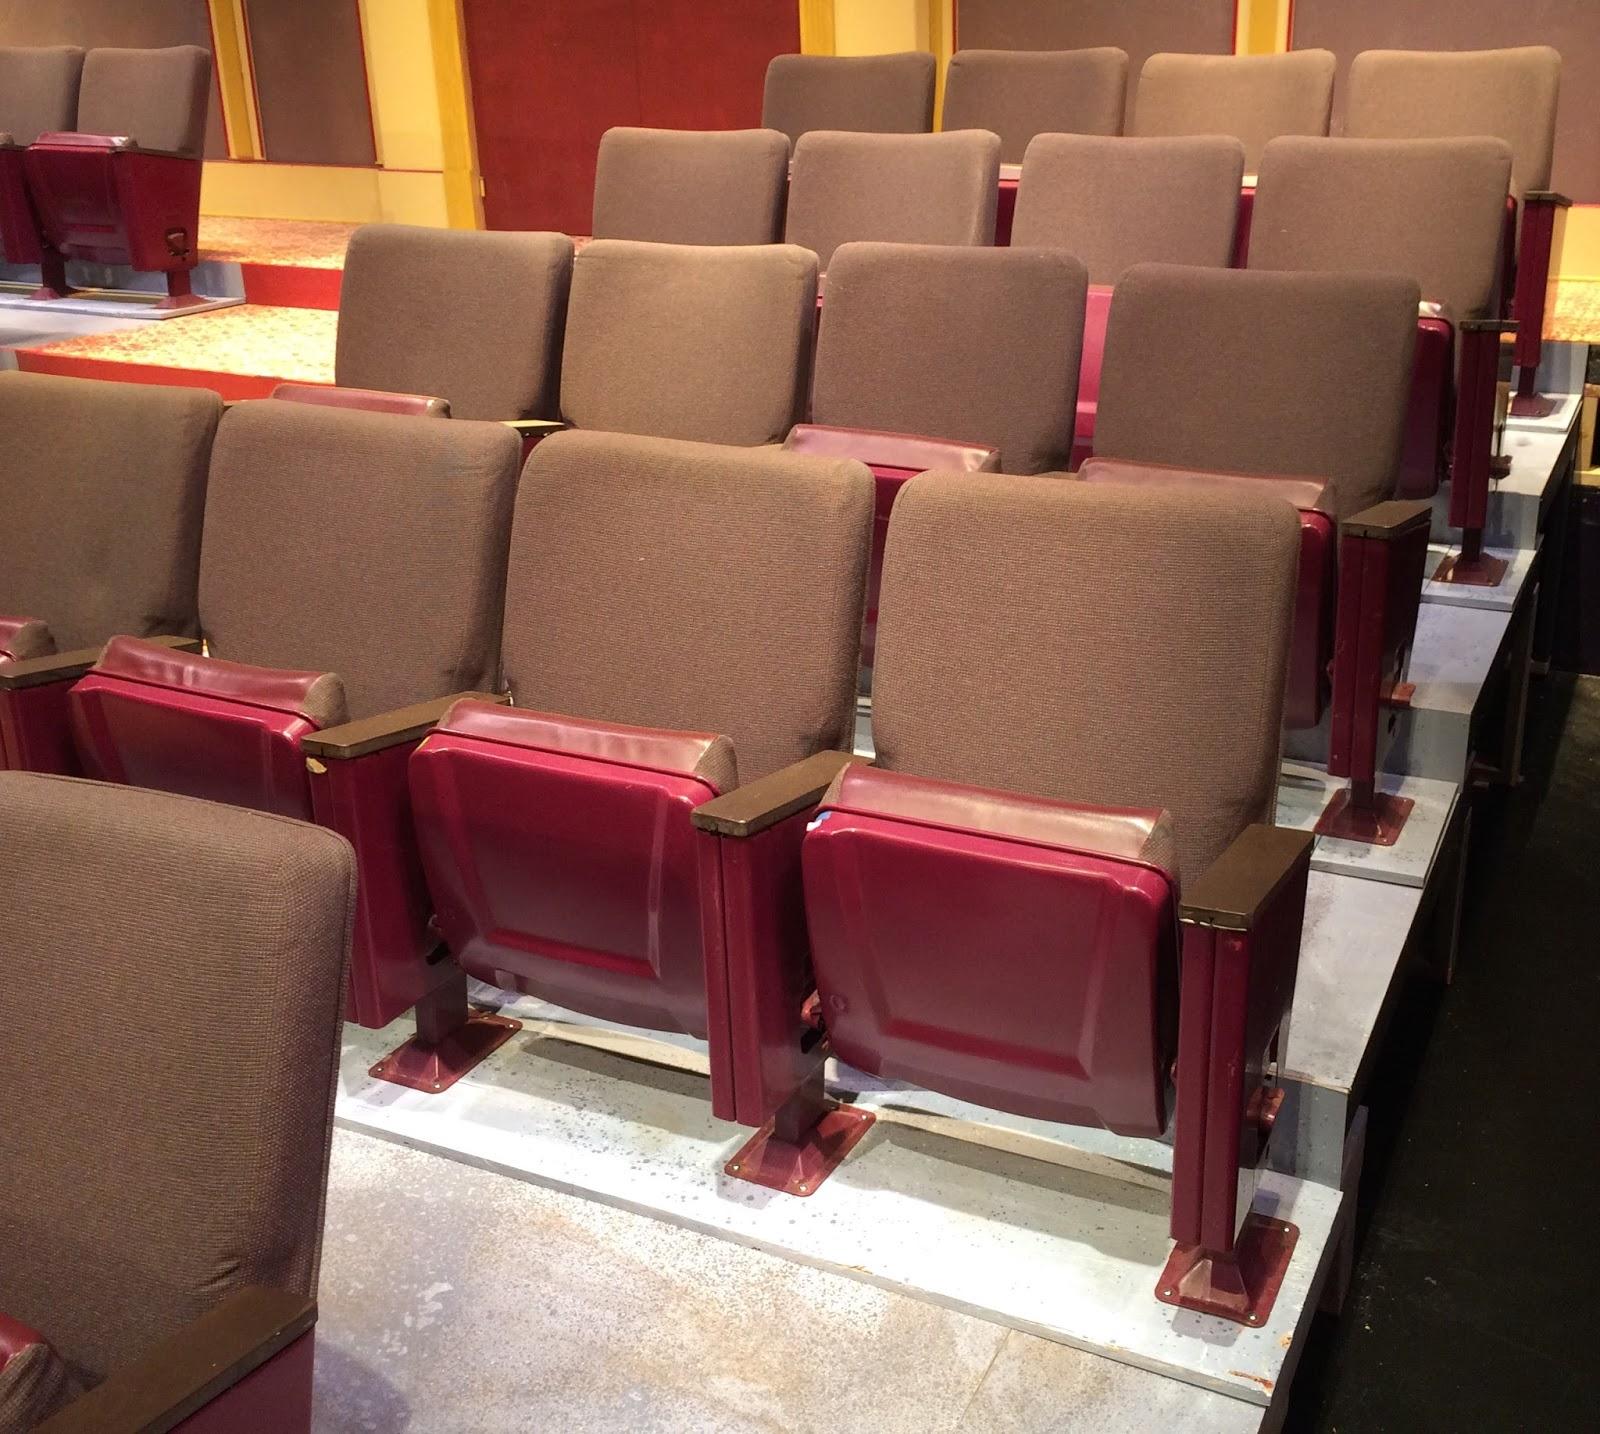 Theater Chairs Best Buy Orange Desk Chair Used Movie Seats Palliser 41952 Elite Home